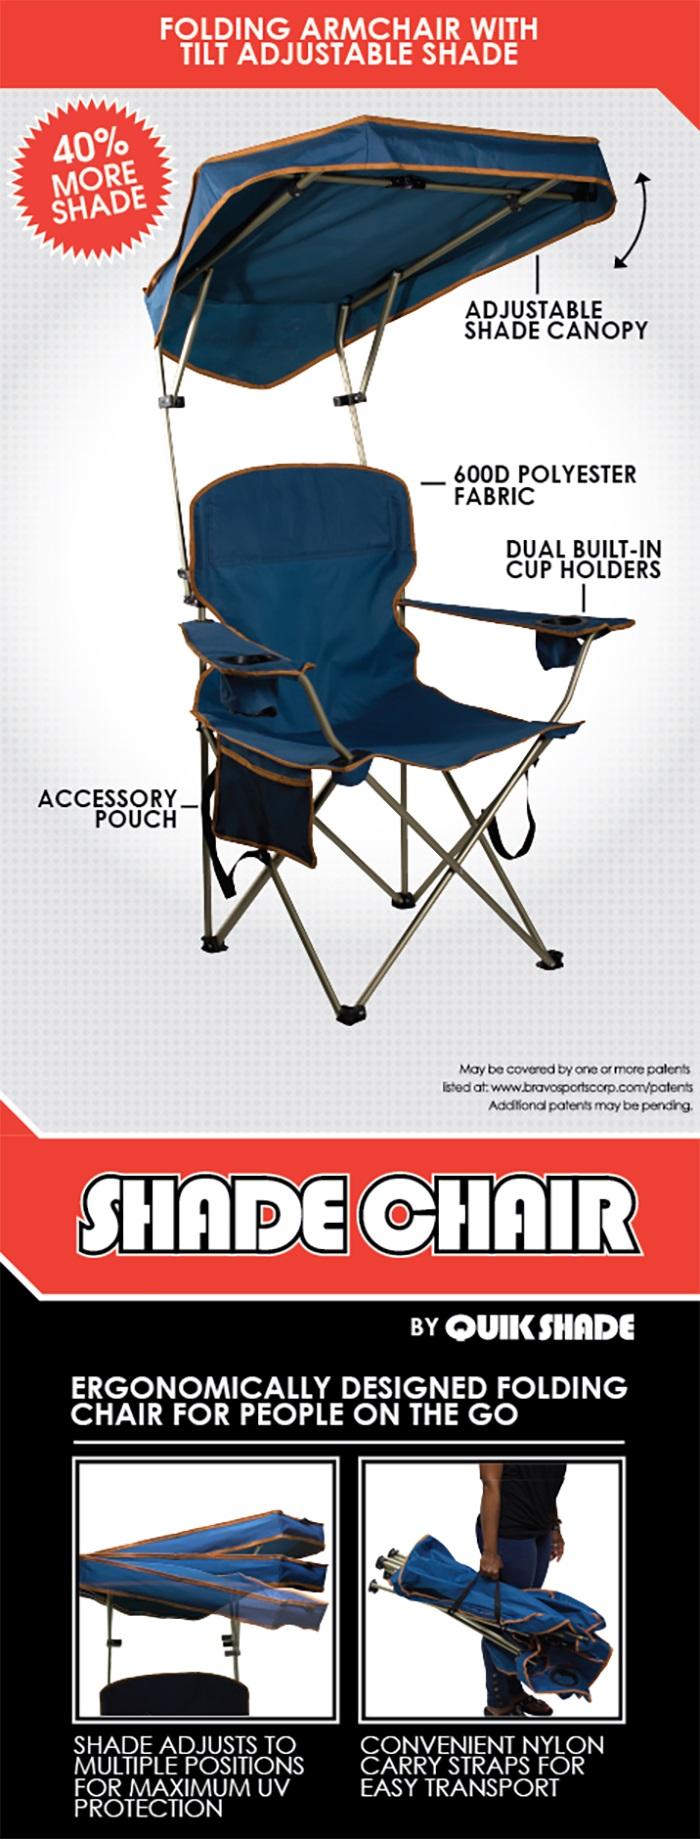 Canopy chair dimensions - Shade Chair